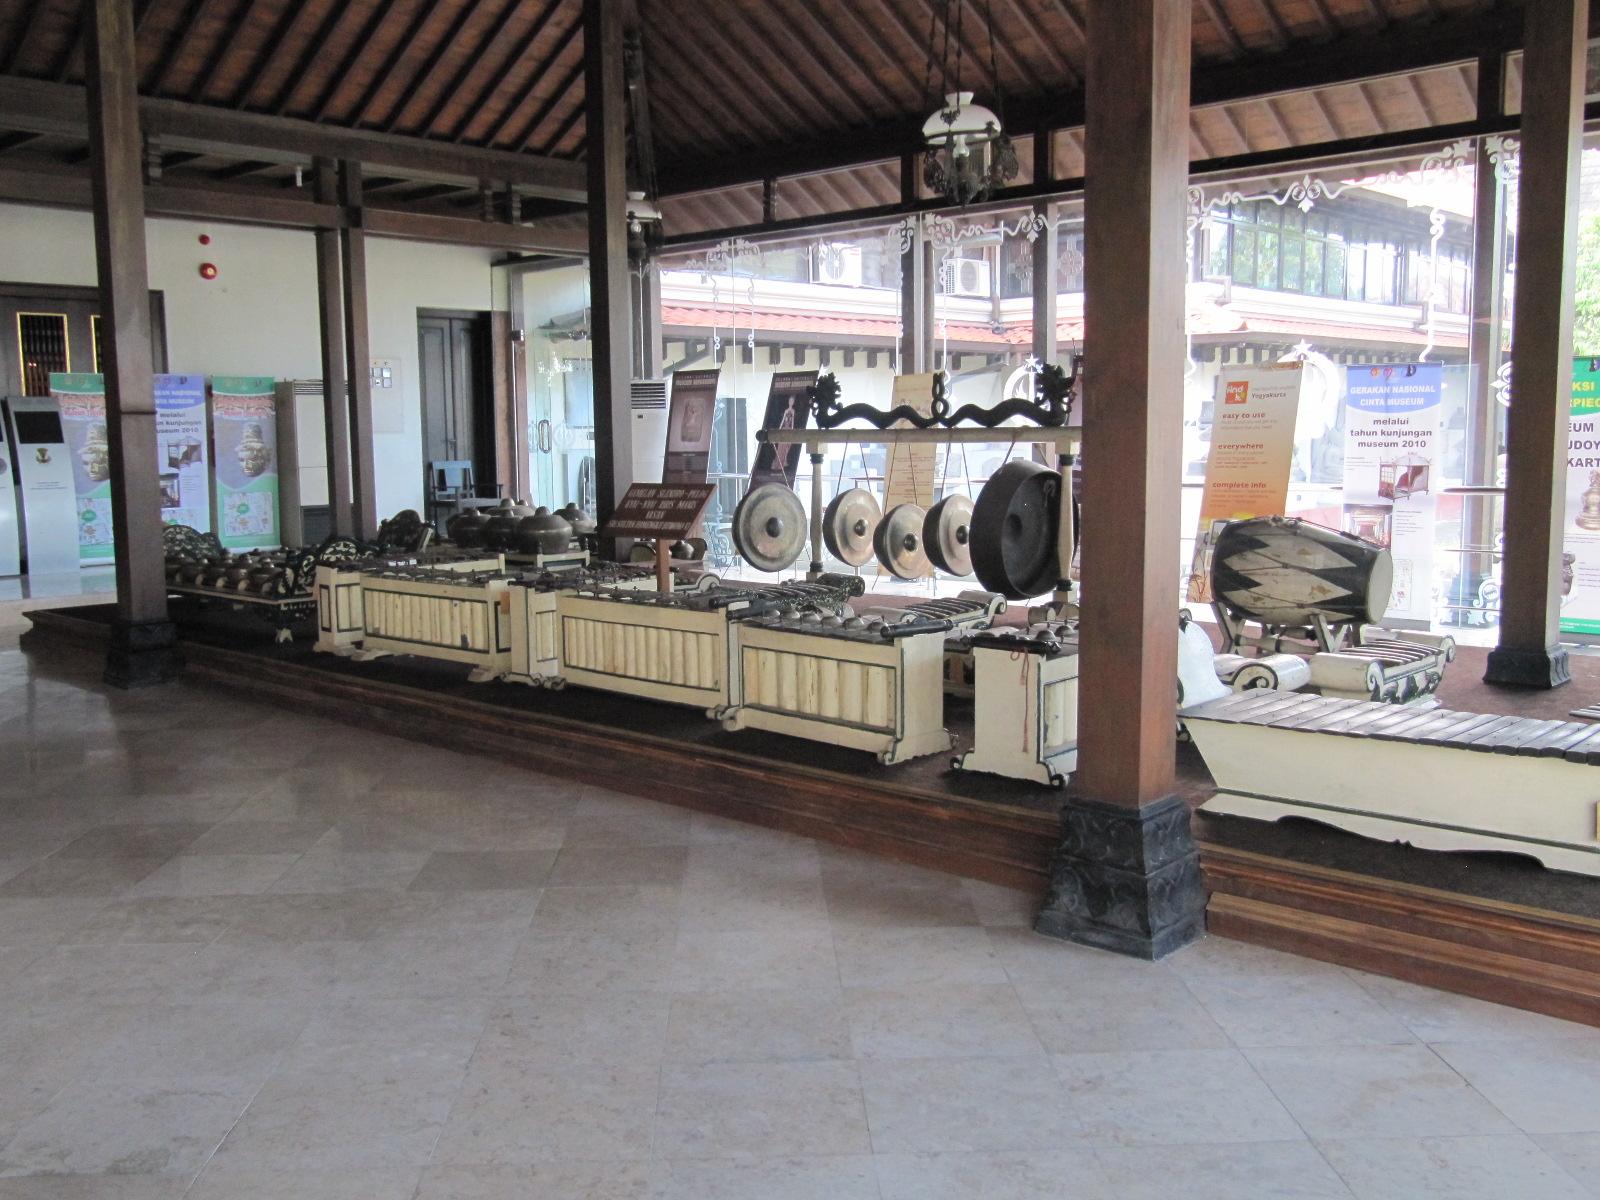 Rhienzfienz Museum Sonobudoyo Yogyakarta Minggu 07 November 2010 Unit Galeri